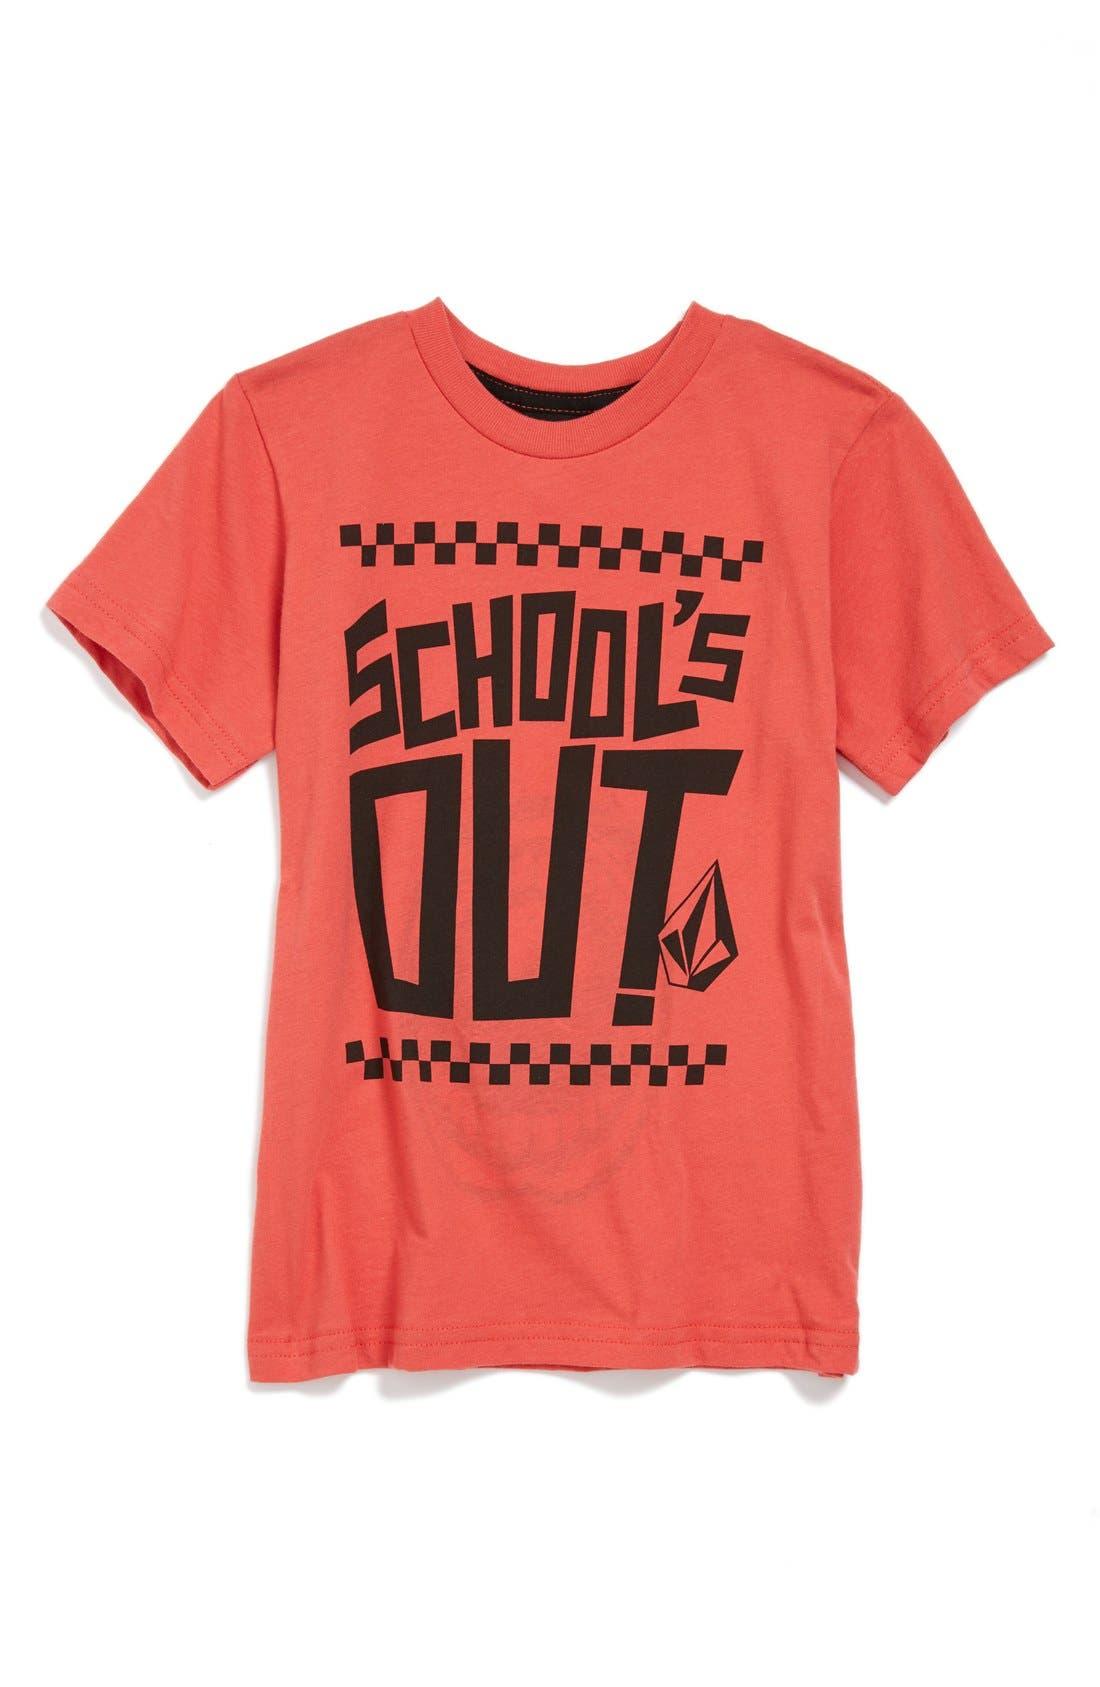 Alternate Image 1 Selected - Volcom 'School's Out' Screenprint Short Sleeve T-Shirt (Little Boys & Big Boys)